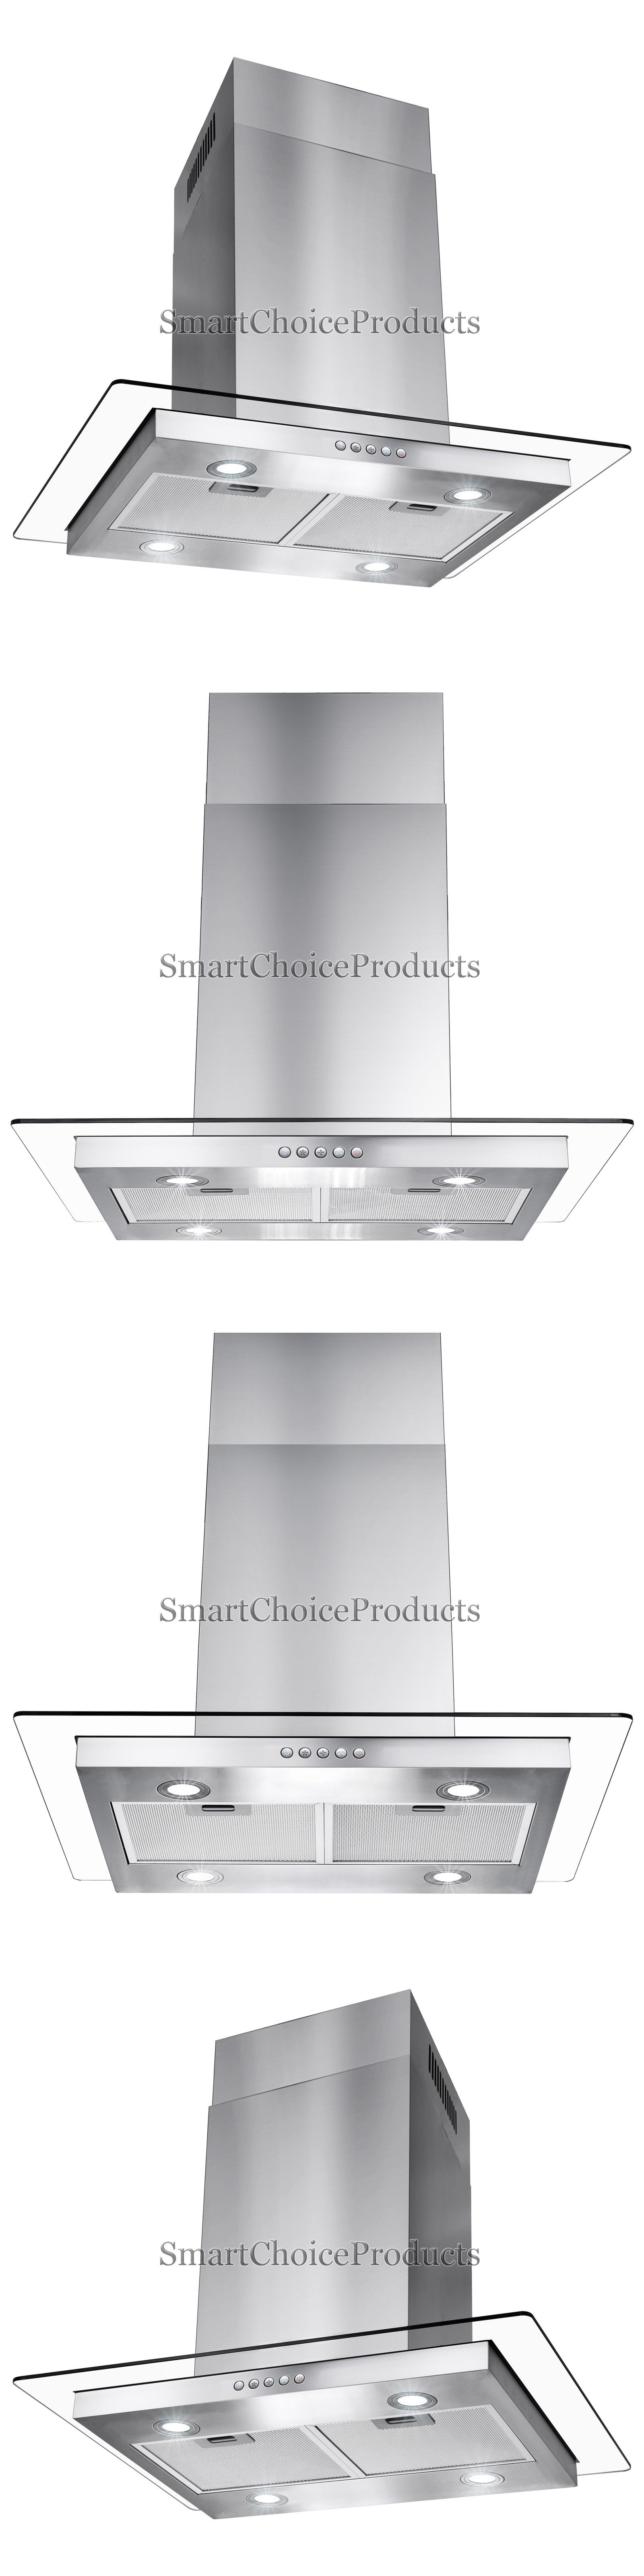 Range Hoods 71253: 30 Flat Glass Stainless Steel Island Canopy ...